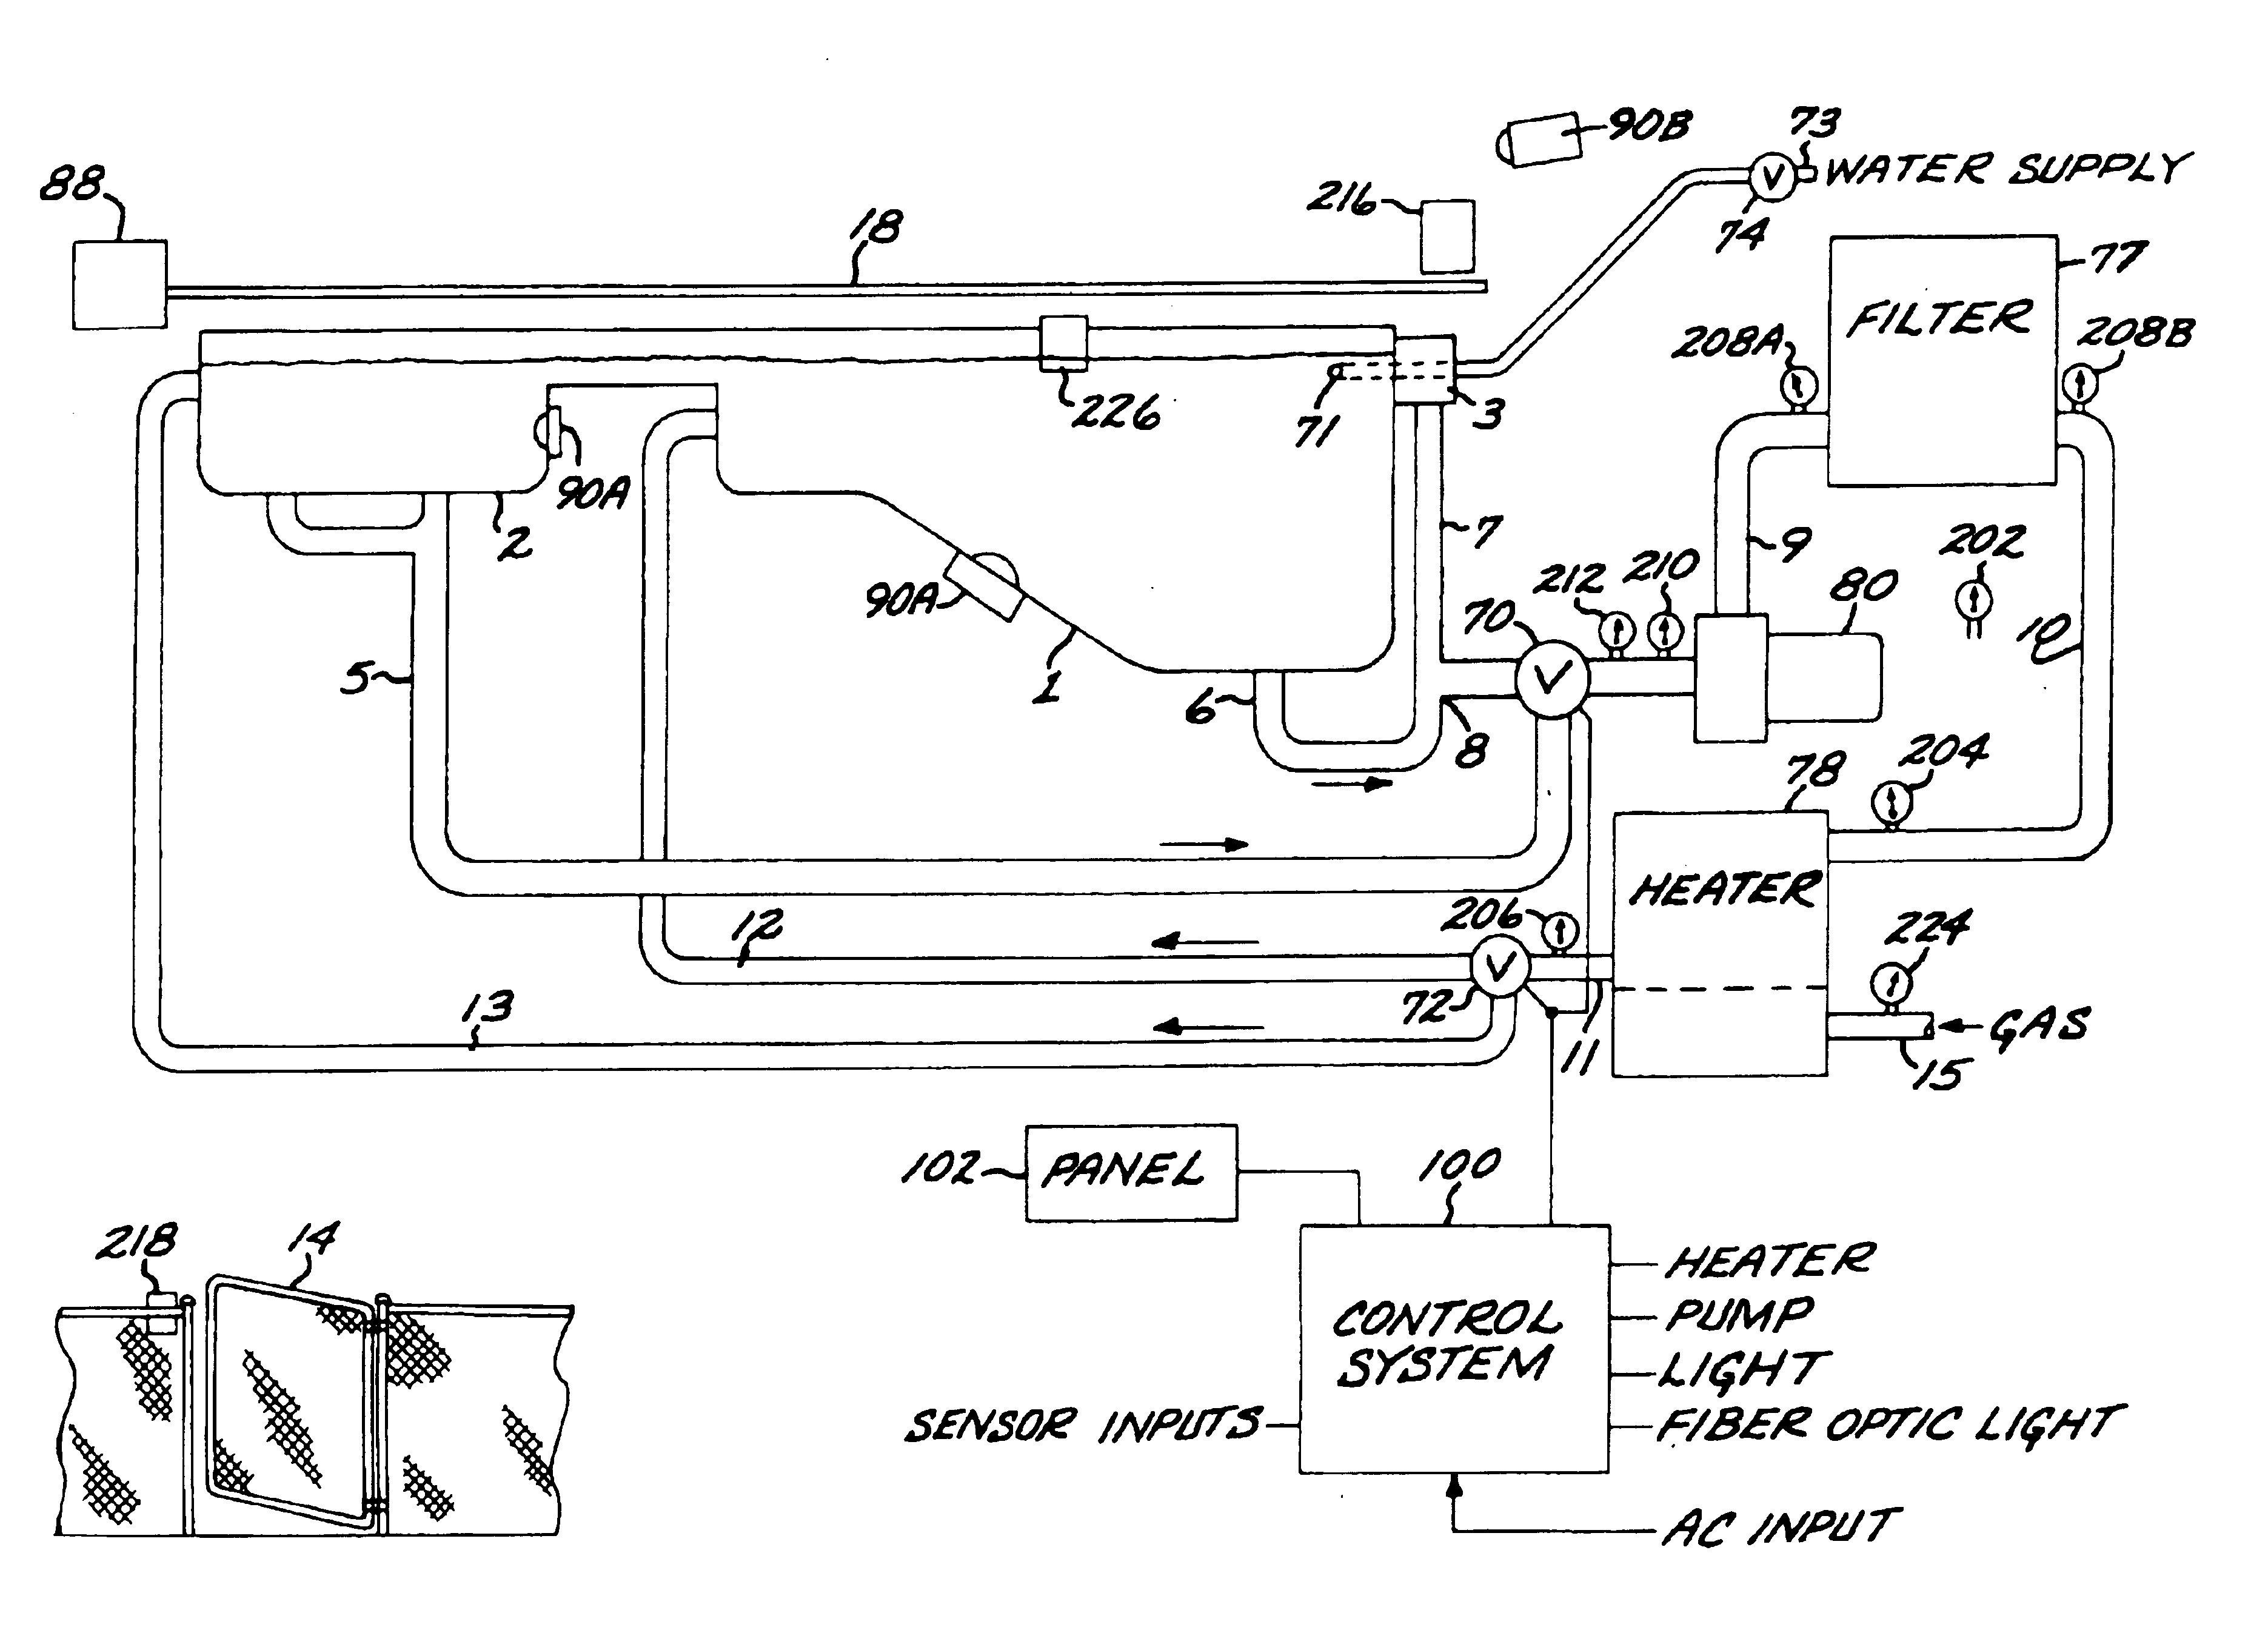 Haier Refrigerator Wiring Diagram | Wiring Diagram - Refrigerator Wiring Diagram Pdf